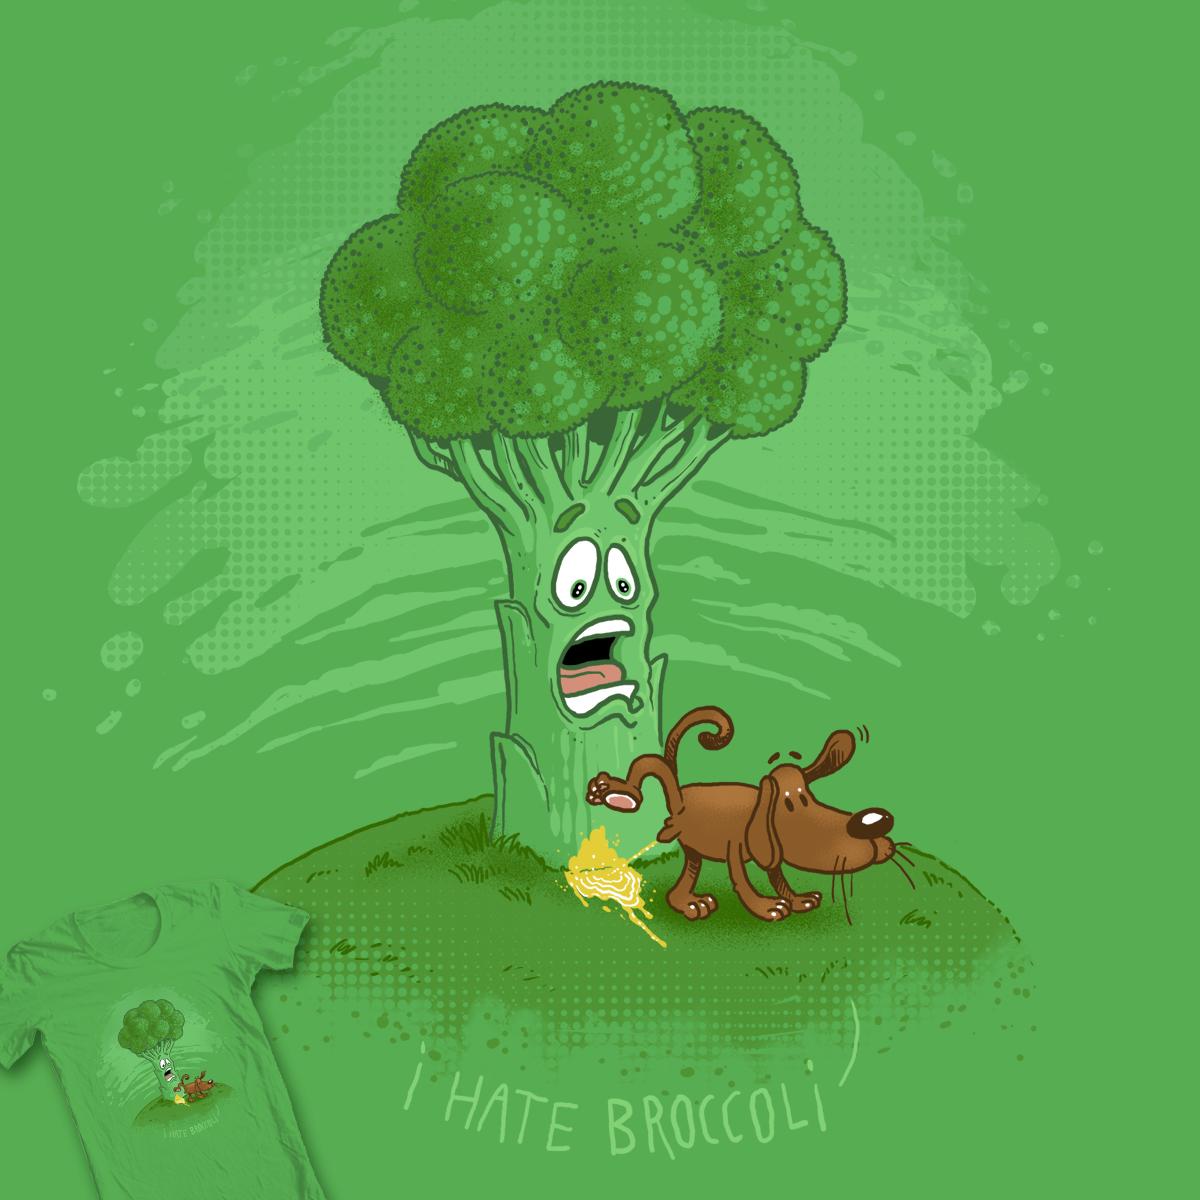 I HATE BROCCOLI by Oktomanuba on Threadless